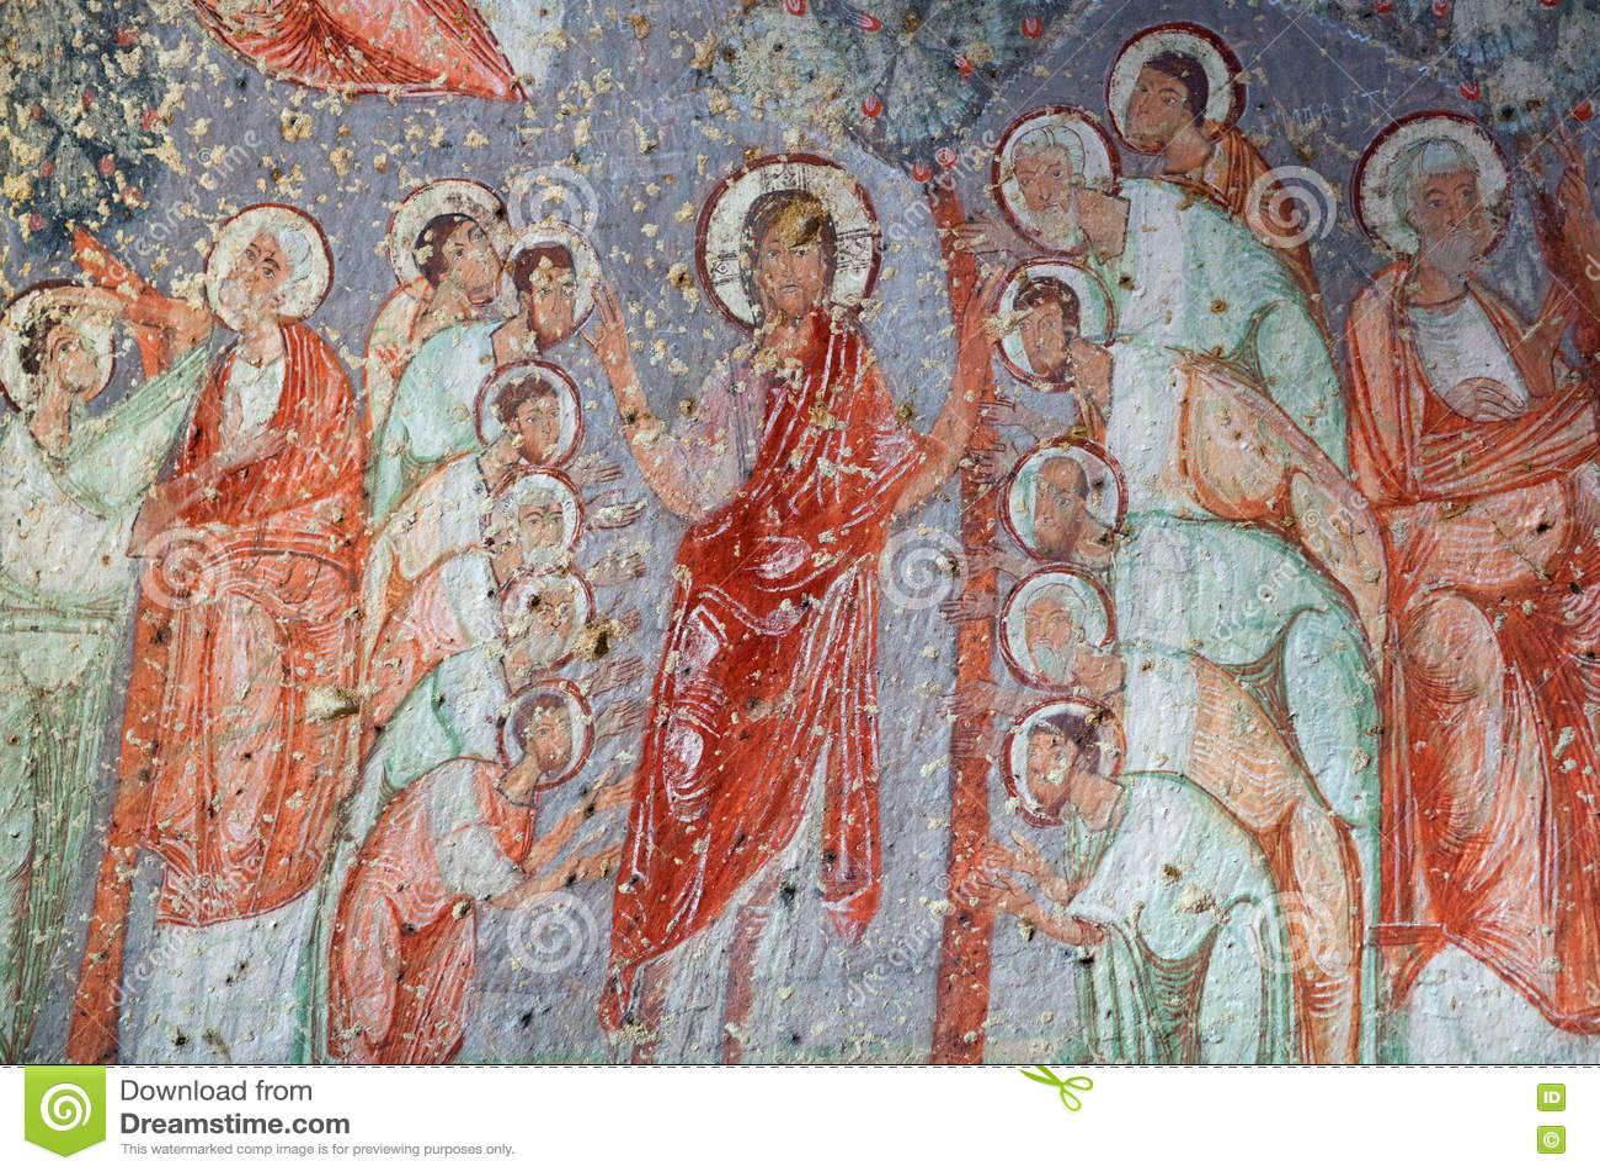 Cavusin kyrka i Cappadocia, Turkiet